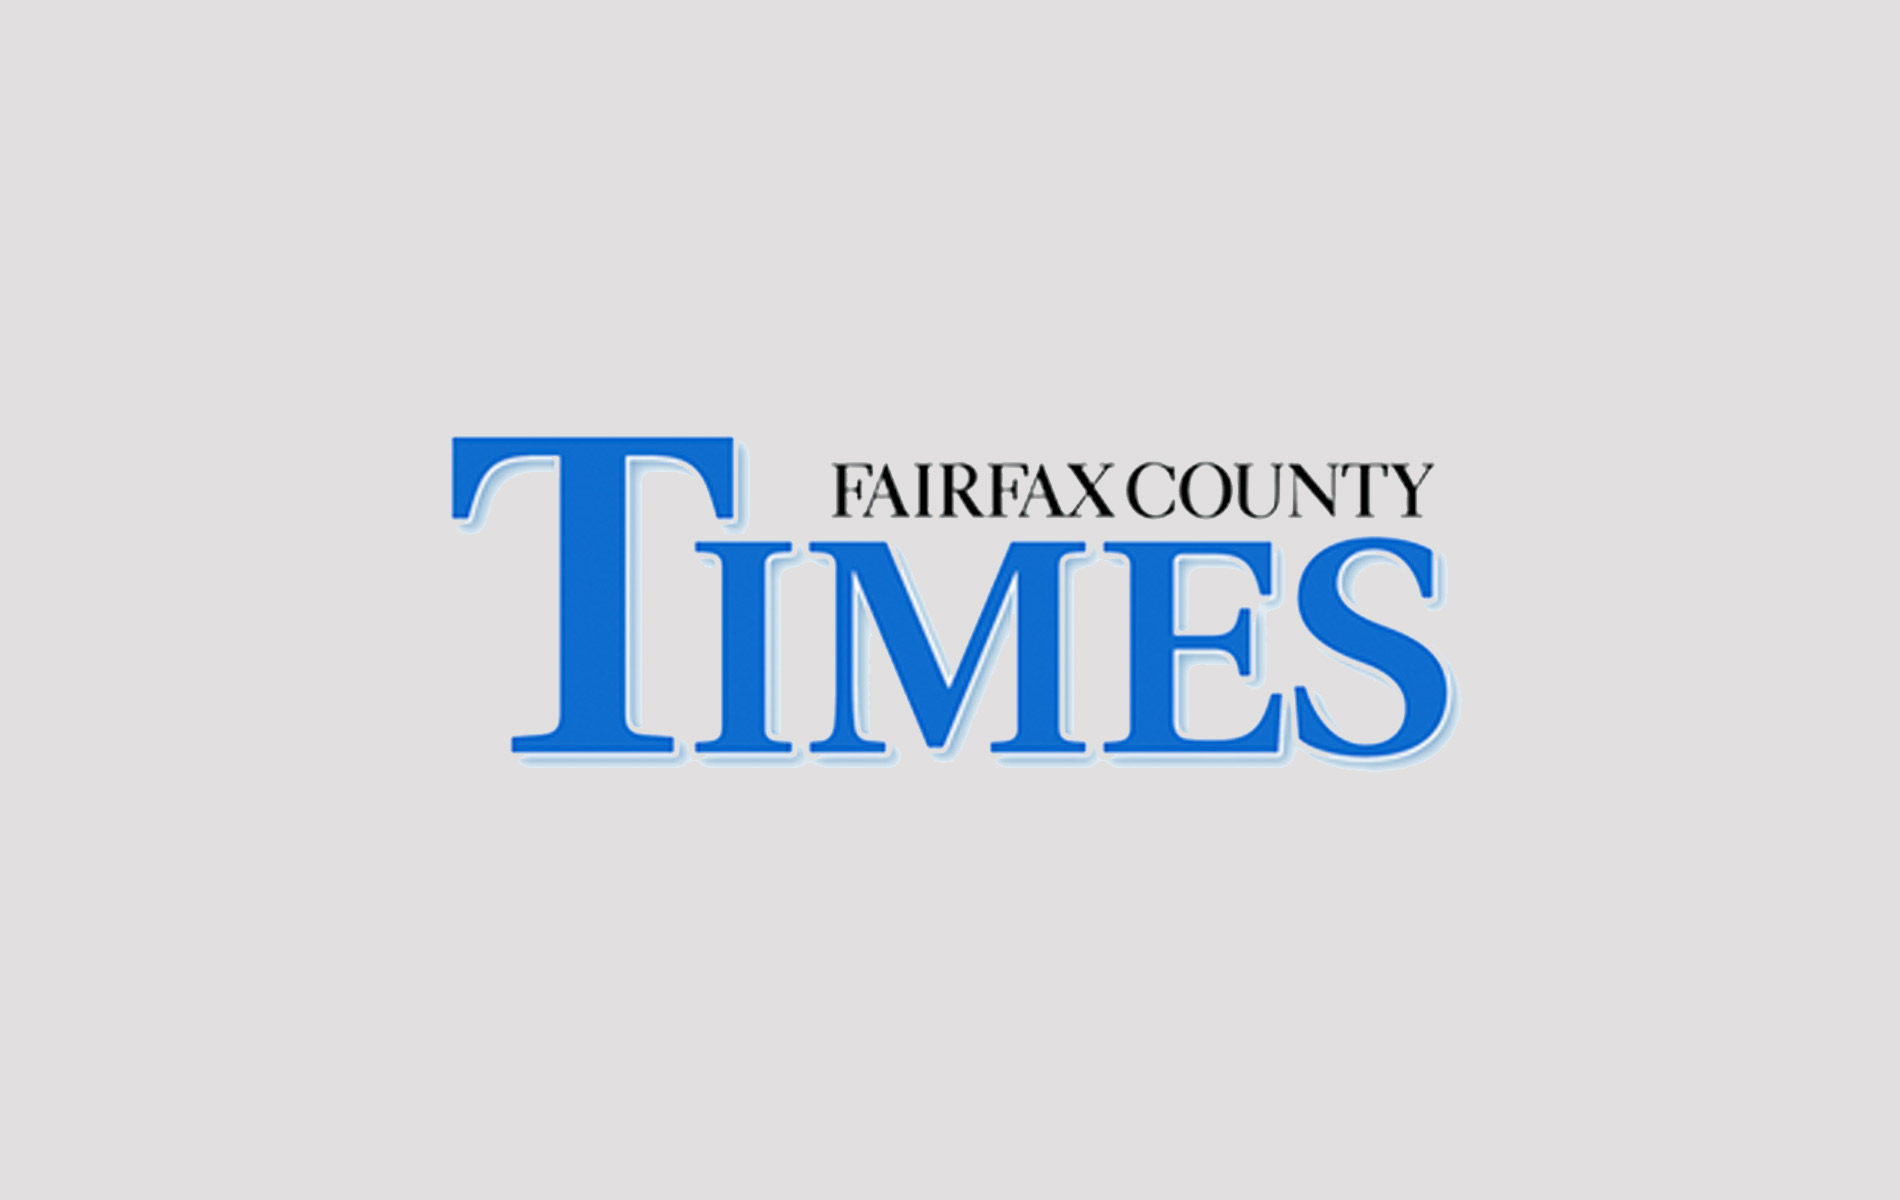 Fairfax County Times